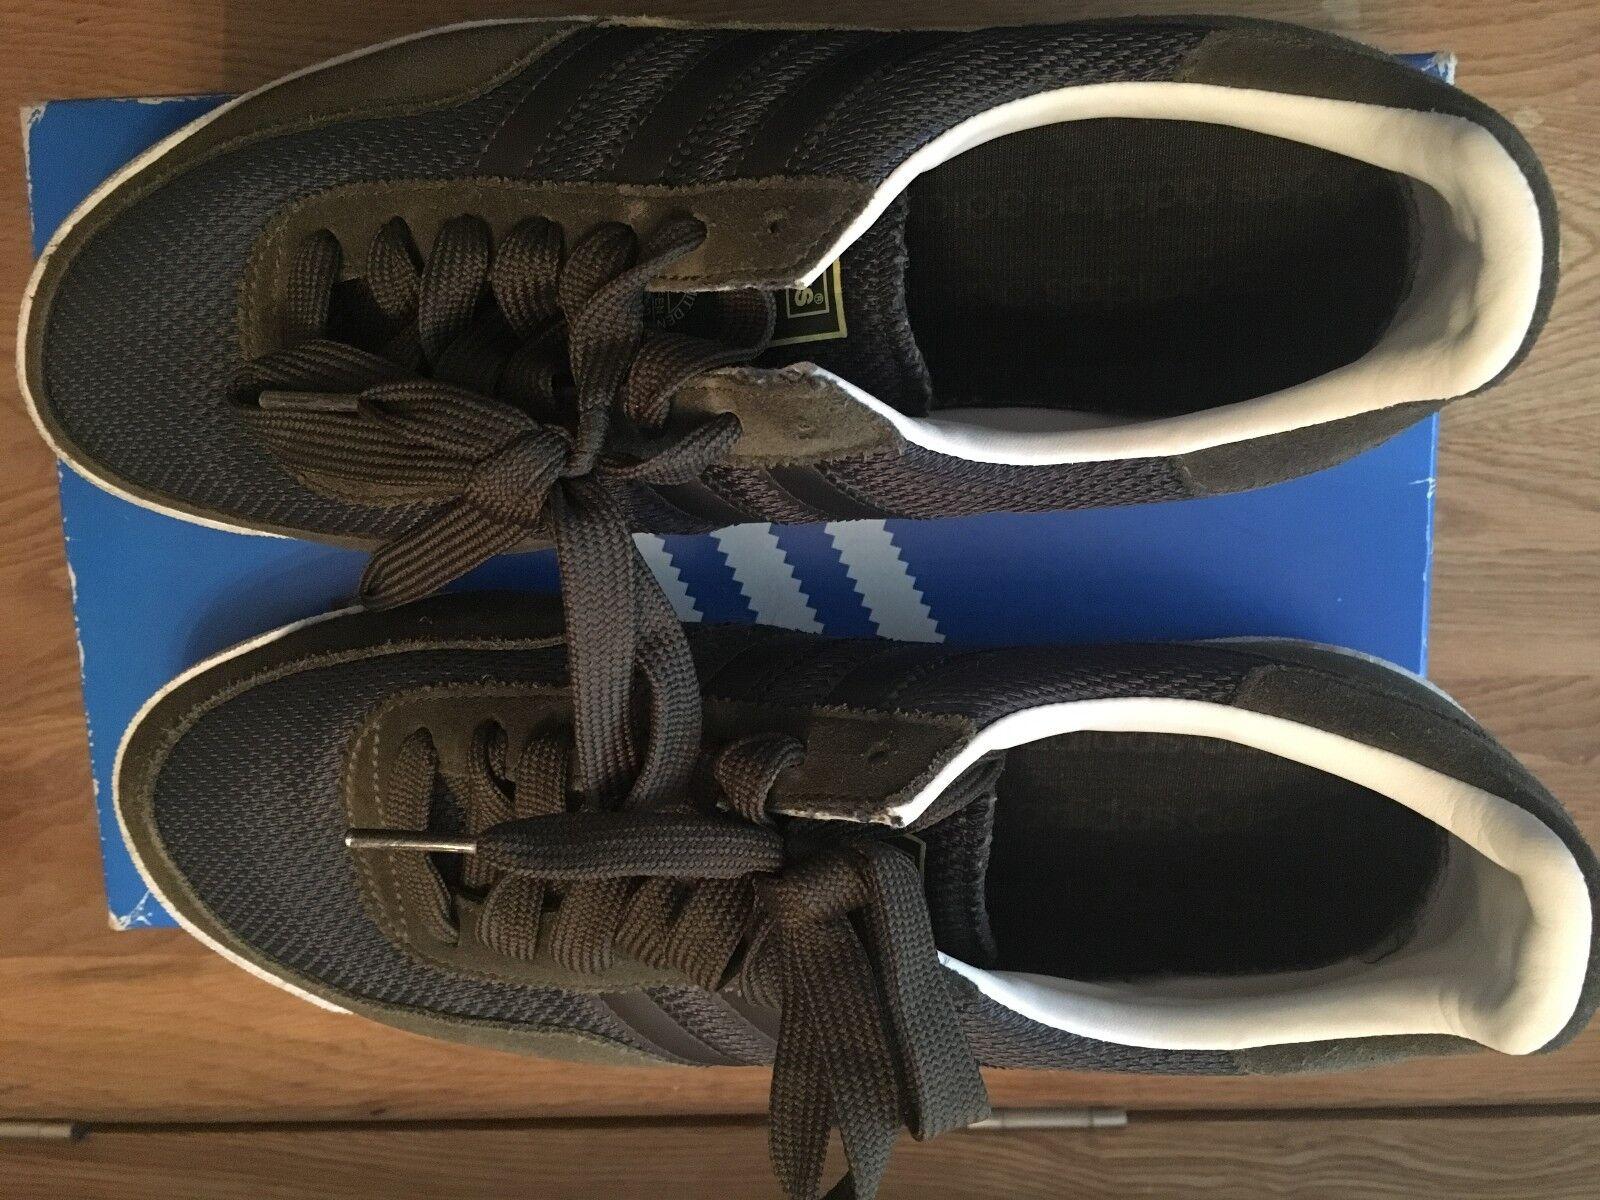 Adidas PT Trainers khaki size size khaki 8 c9a97b